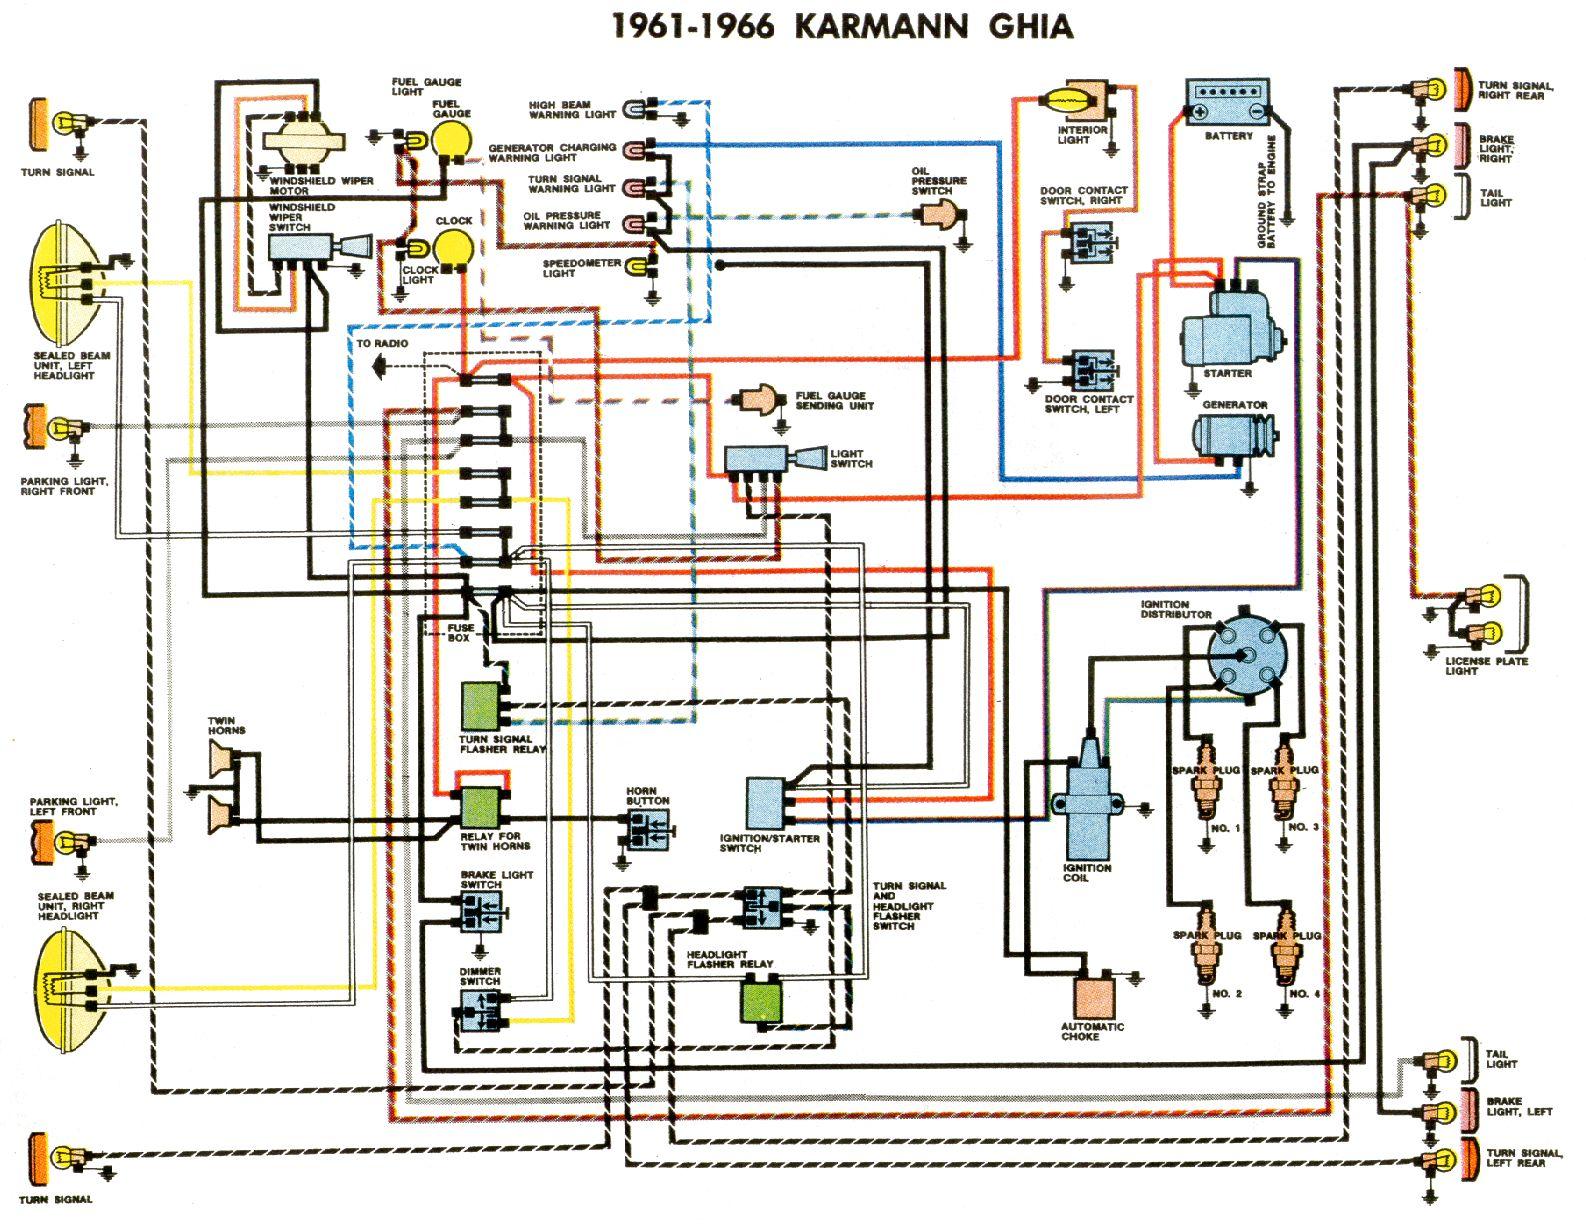 porsche 356 wiring diagram residential electrical symbols \u2022 porsche 912 wiring -diagram perfect porsche 356 wiring harness 1954 vignette electrical rh suaiphone org porsche 356 pre a wiring